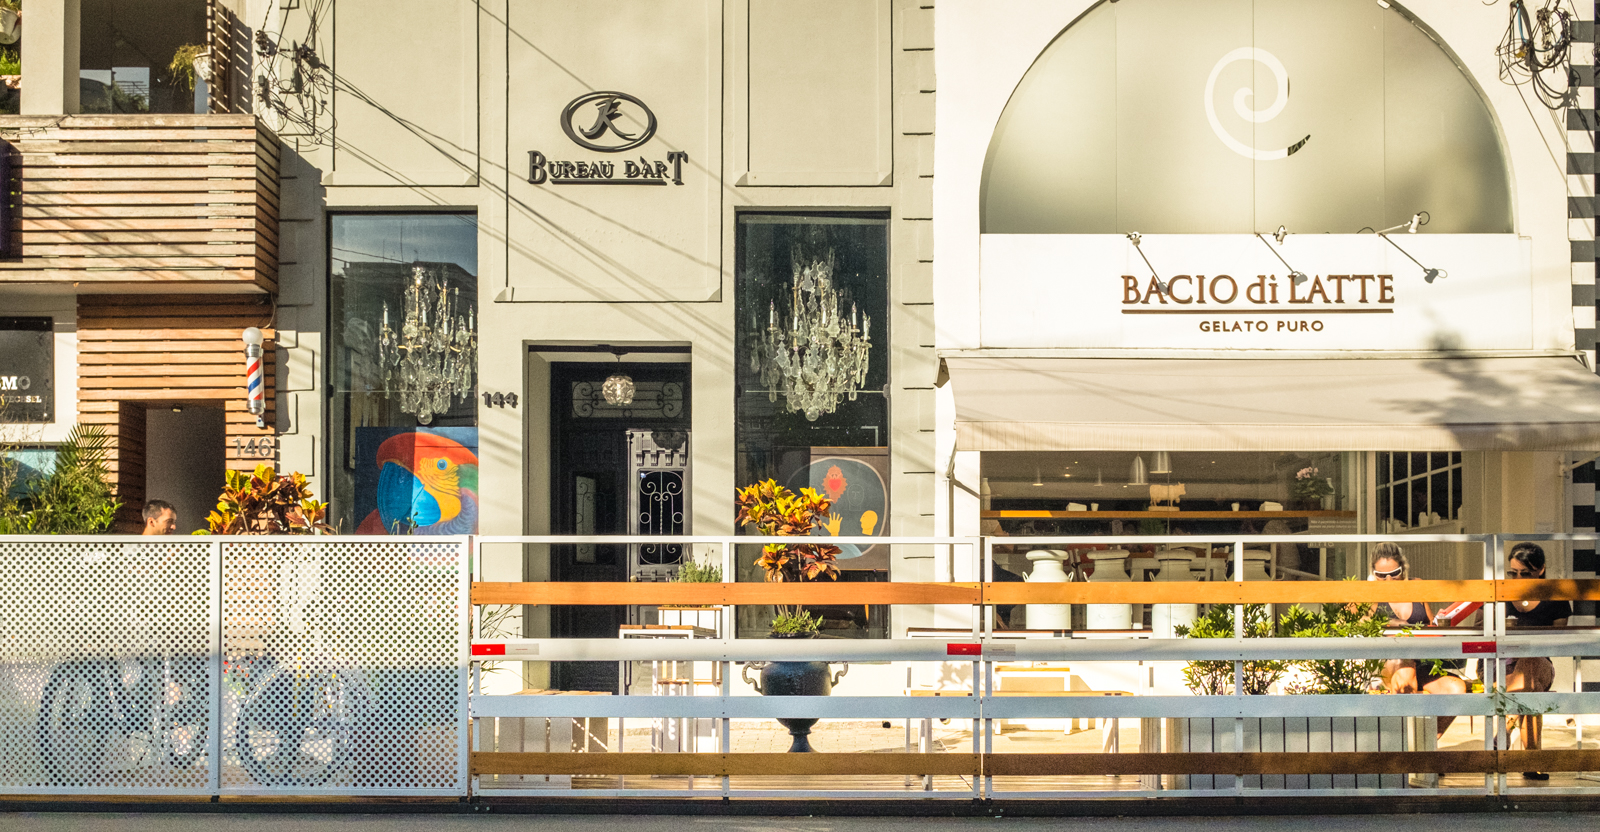 PARKLET BACIO DI LATTE - RUA OSCAR FREIRE - FOTO 03 - HAA.JPG